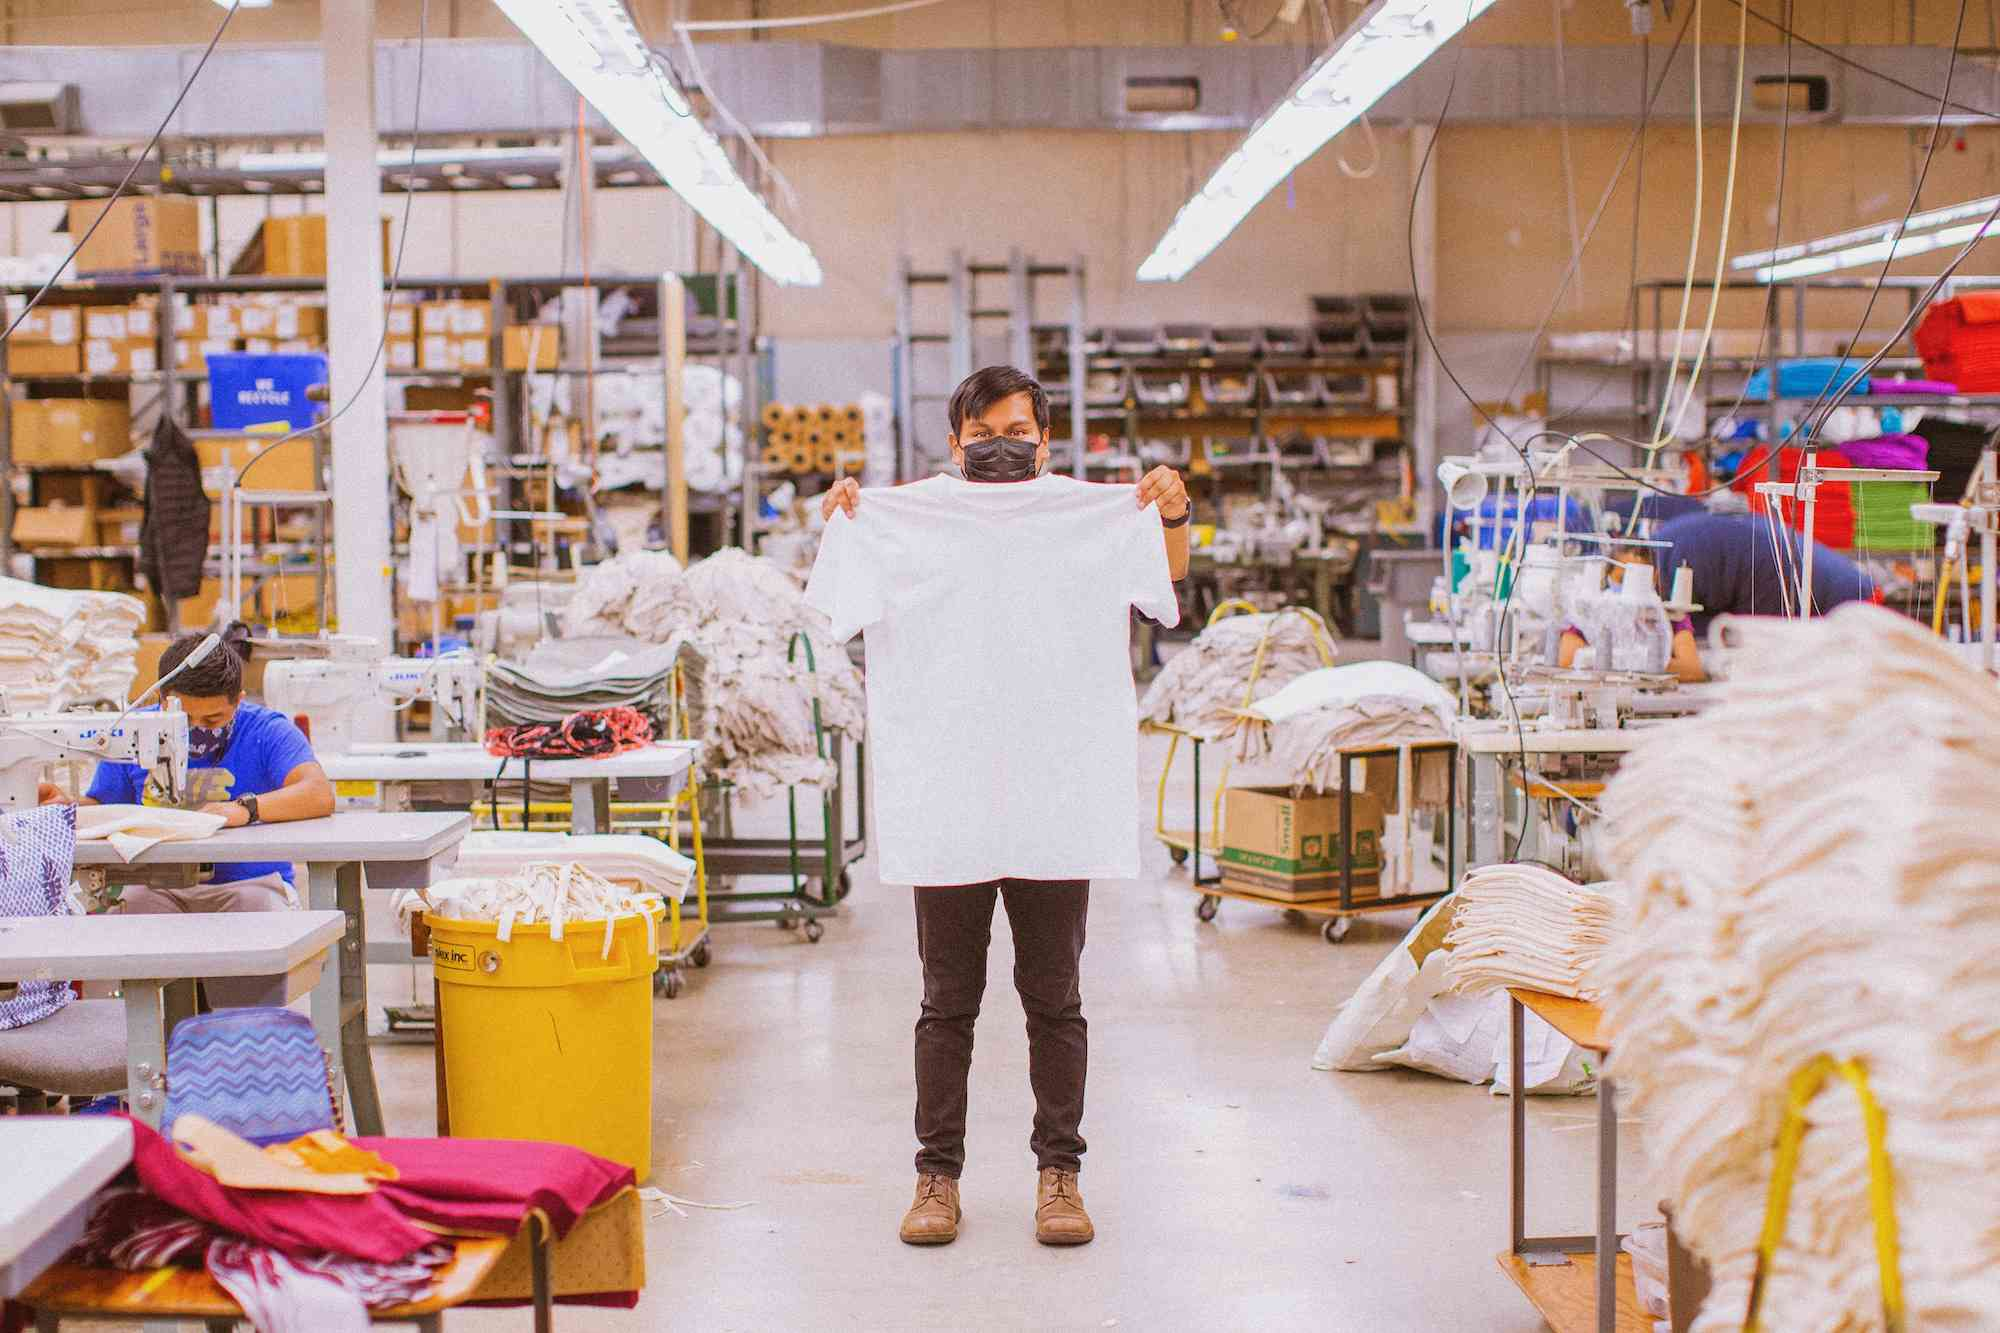 10K Pounds of Cotton project